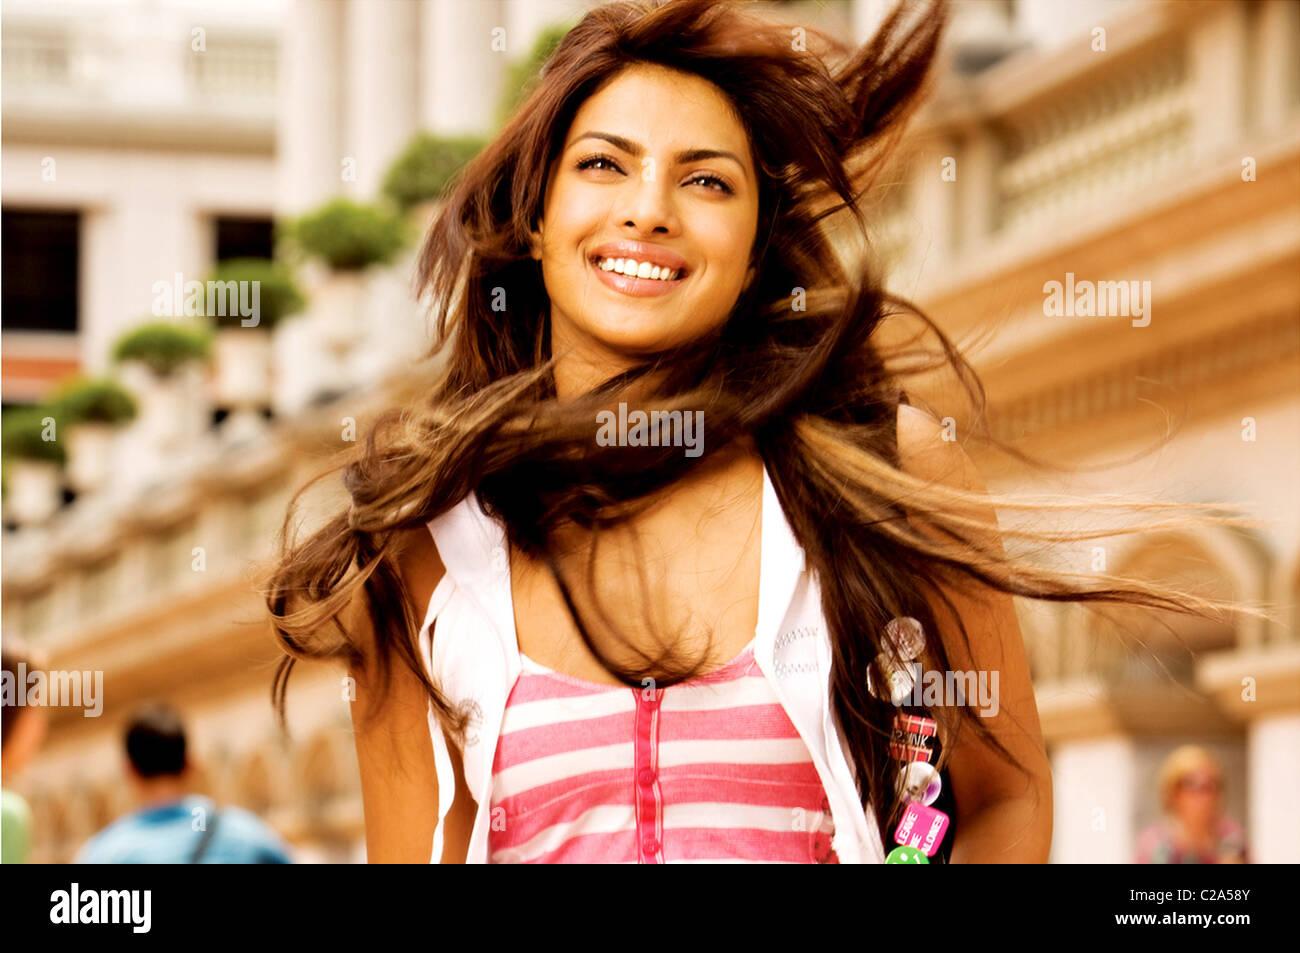 Priyanka Chopra Stock Photos Priyanka Chopra Stock Images Alamy